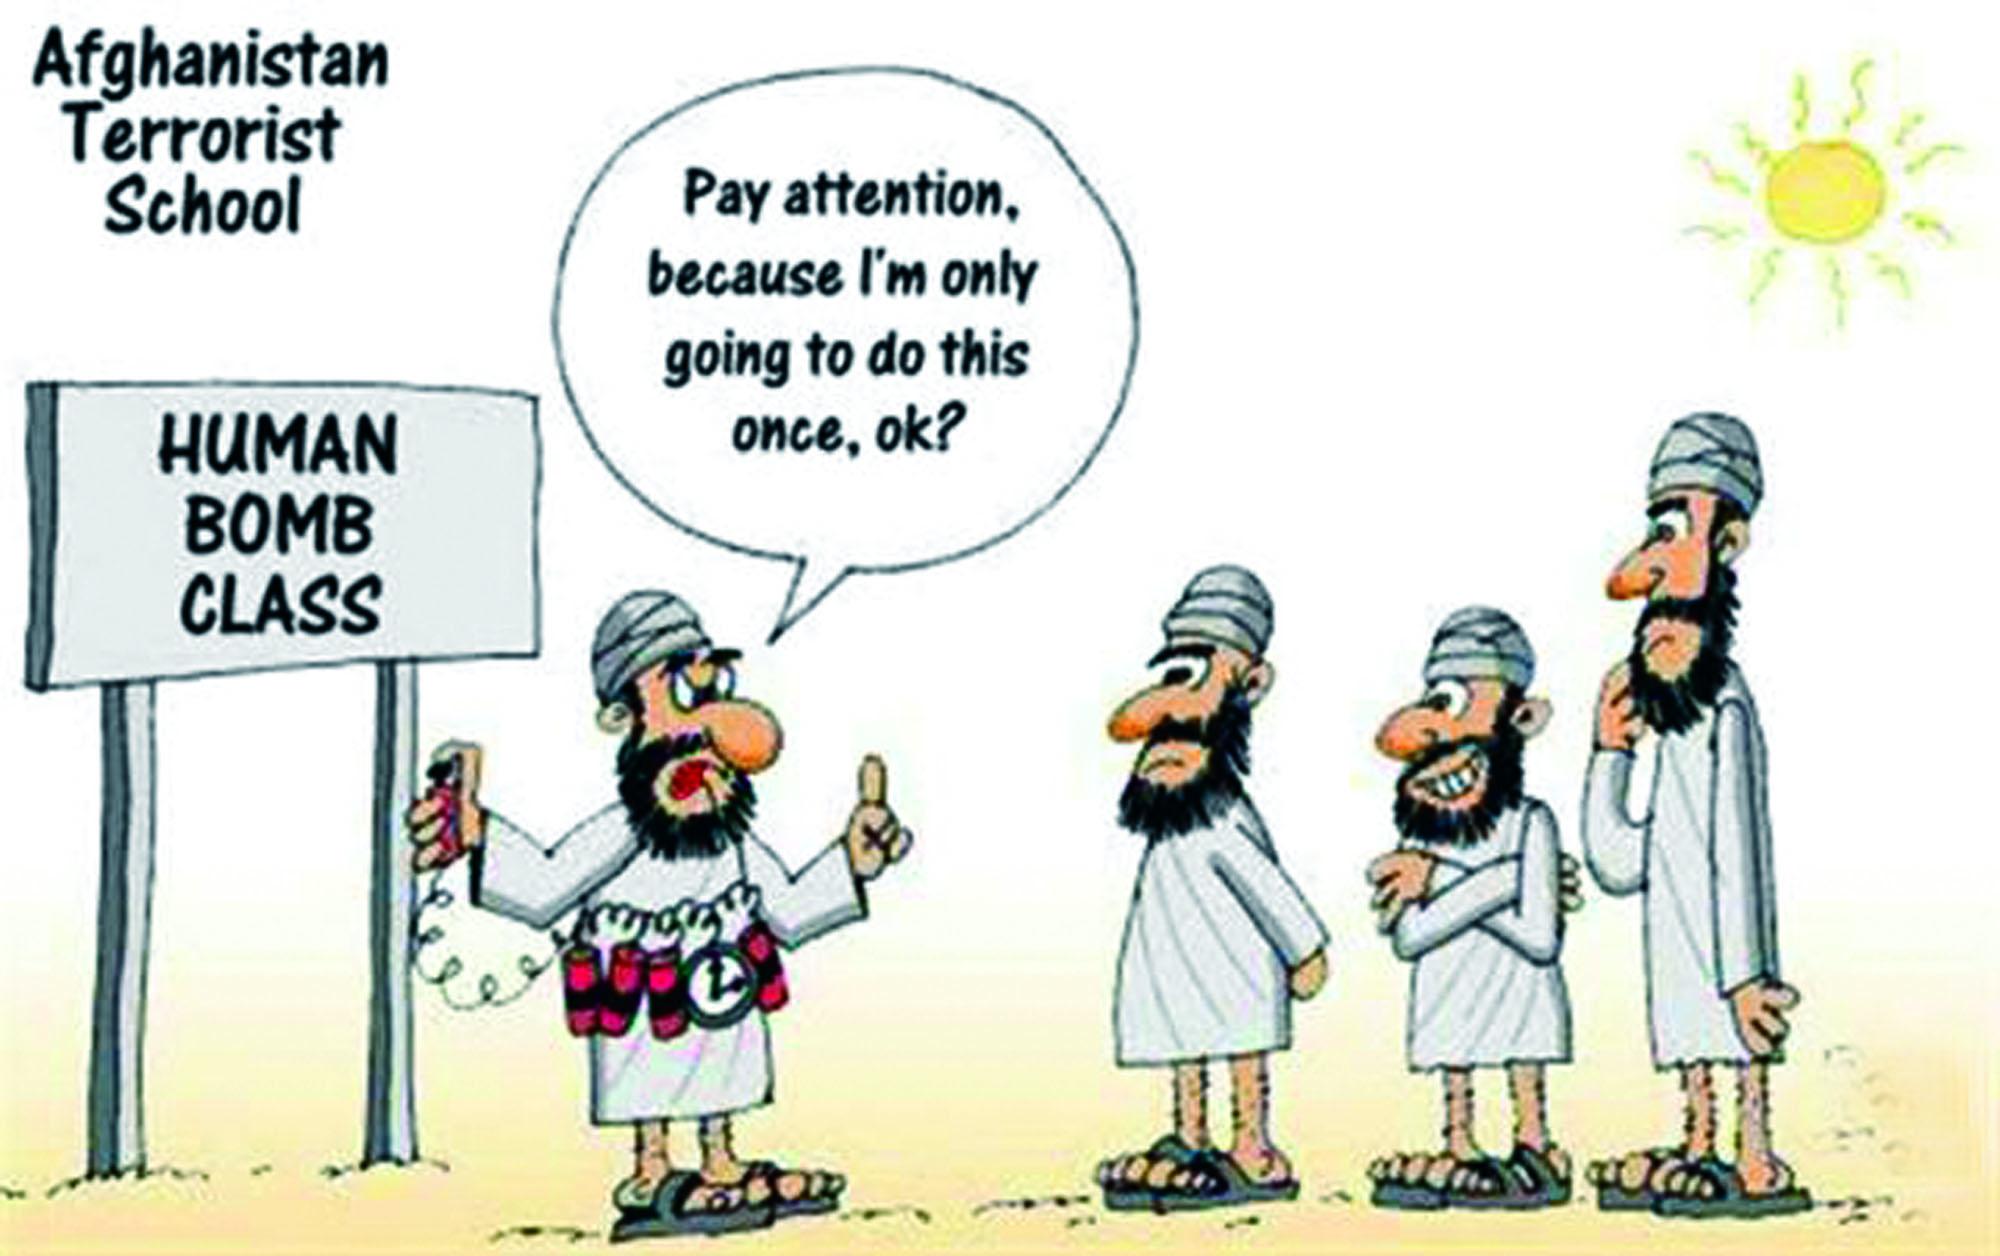 Terrorist MOs